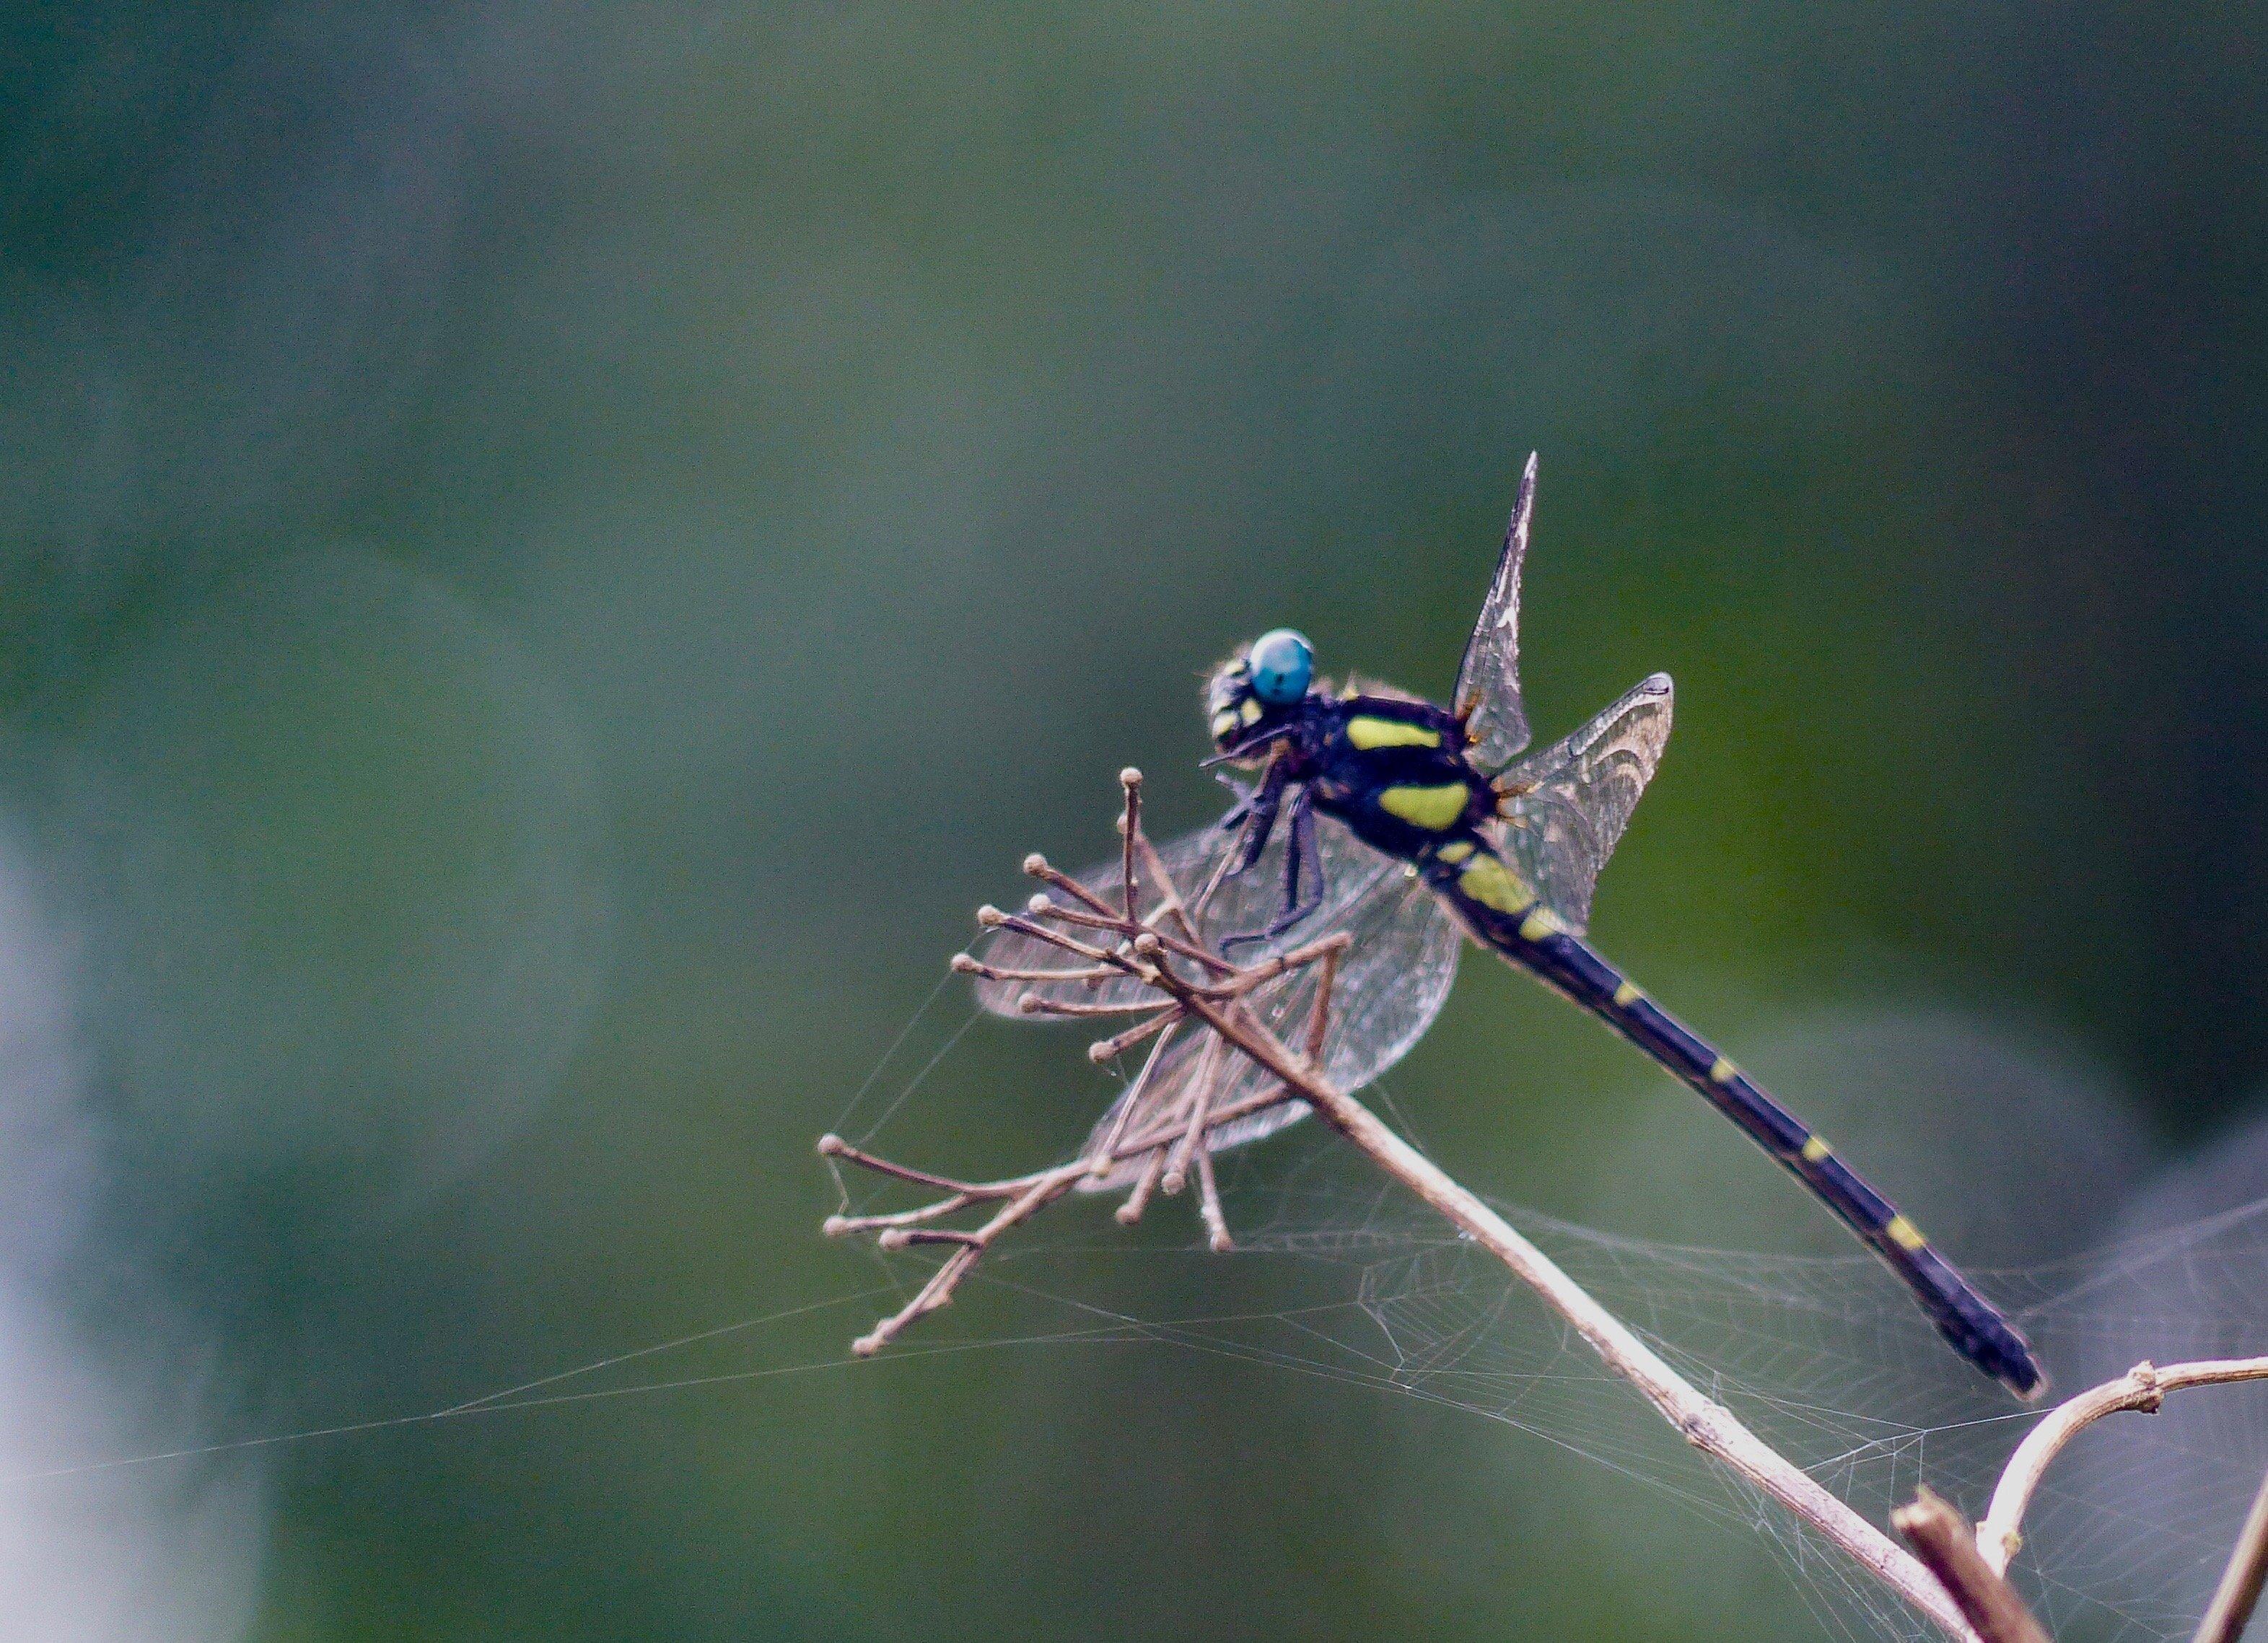 Bhagwan Mahavir wildlife sanctuary